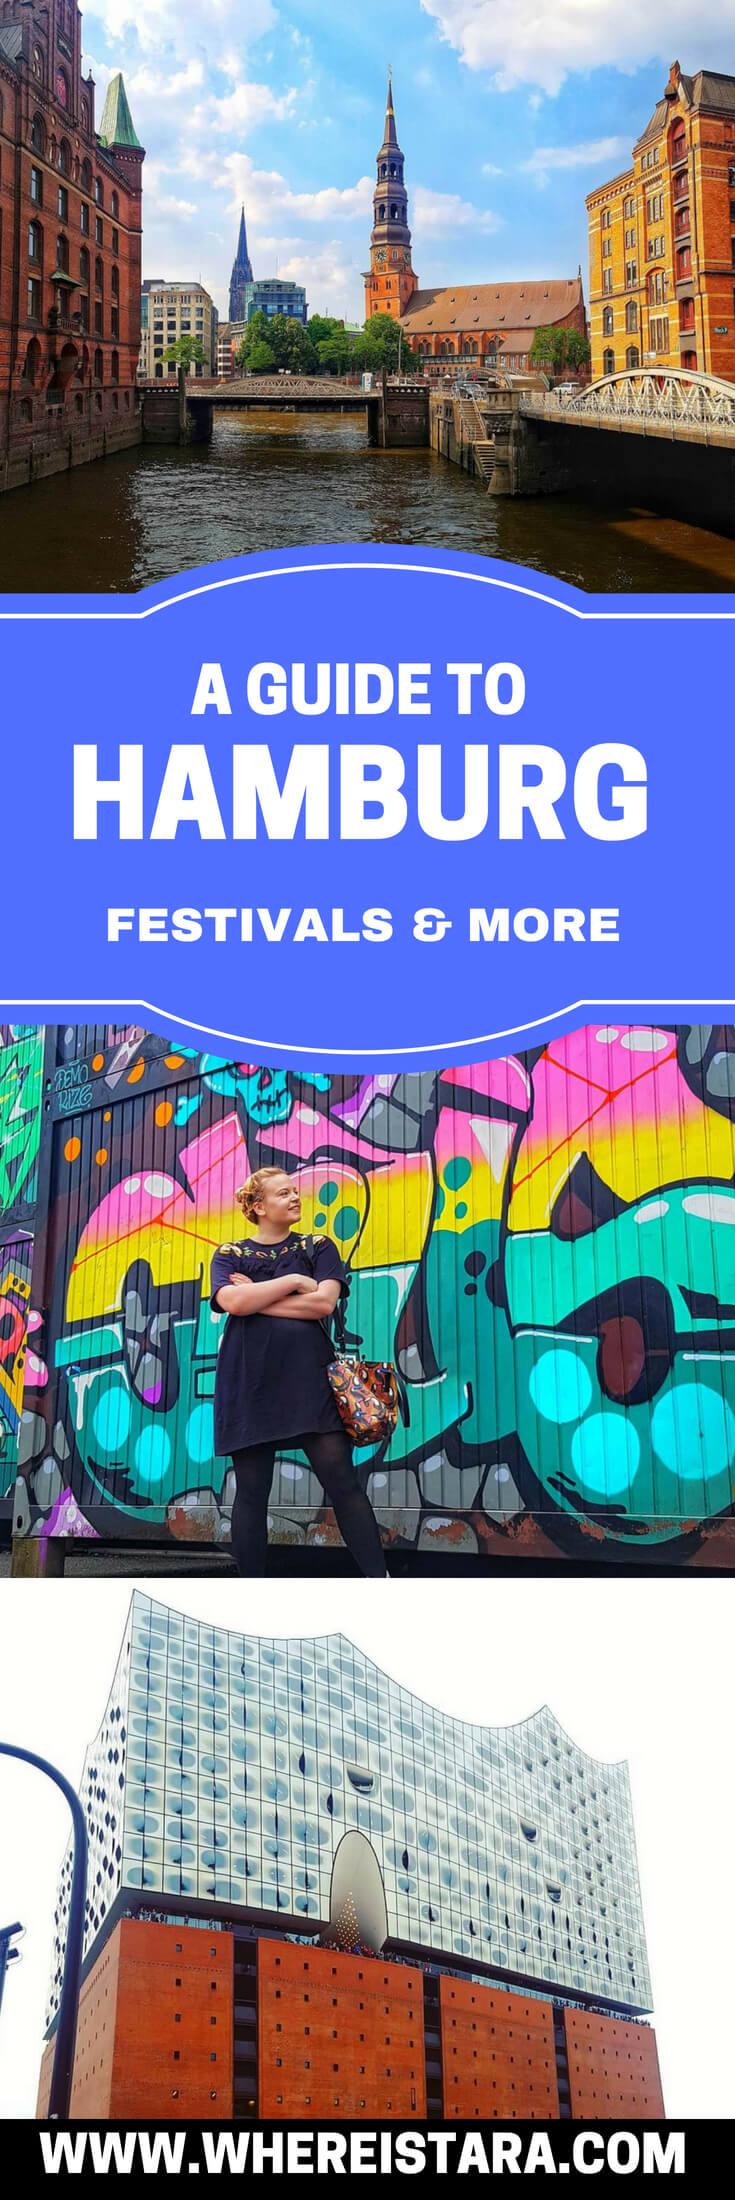 elbjazz festival hamburg festivals things to do Hamburg guide